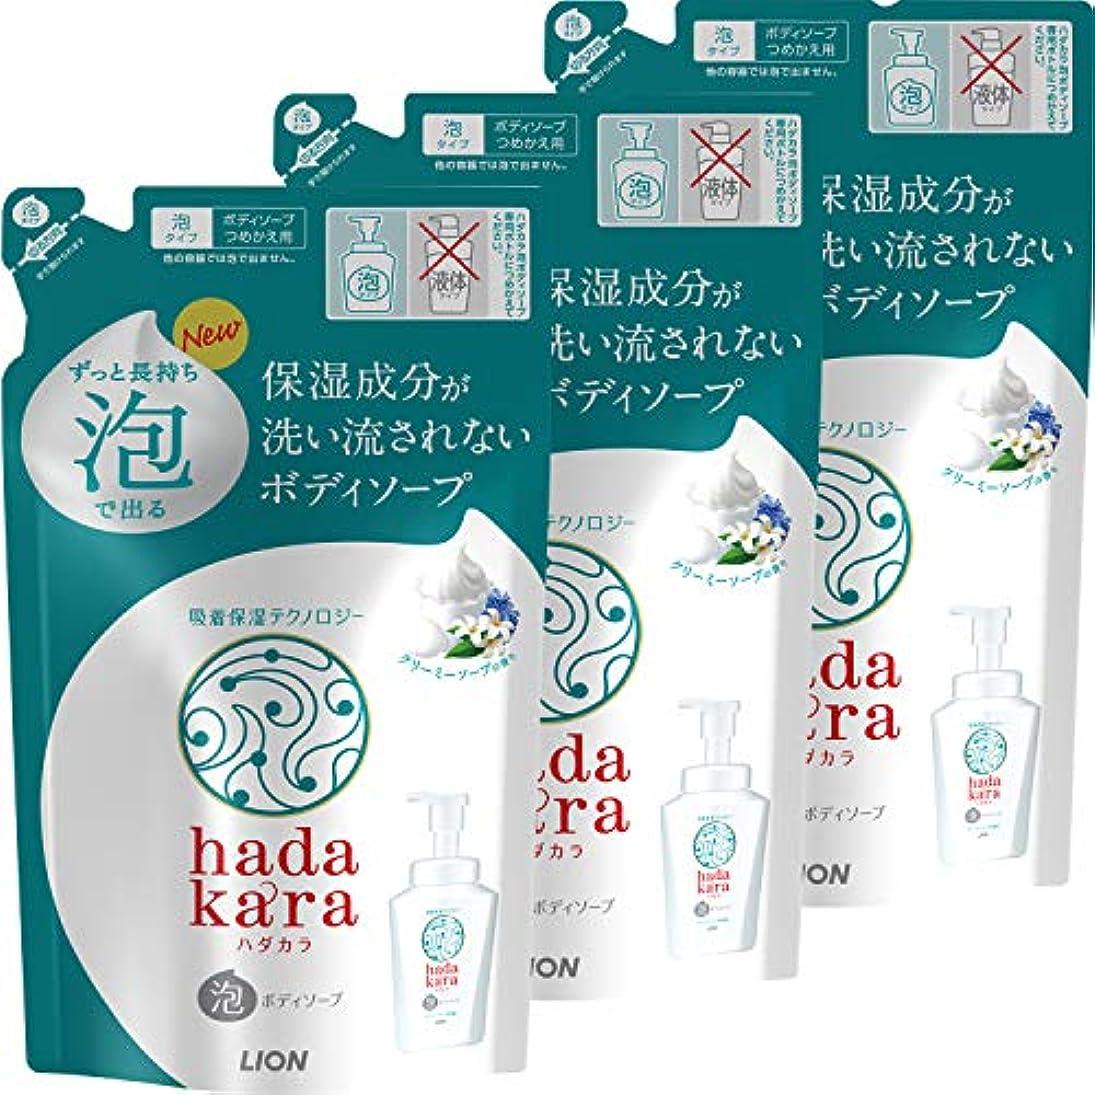 hadakara(ハダカラ) ボディソープ 泡タイプ クリーミーソープの香り 詰替440ml×3個